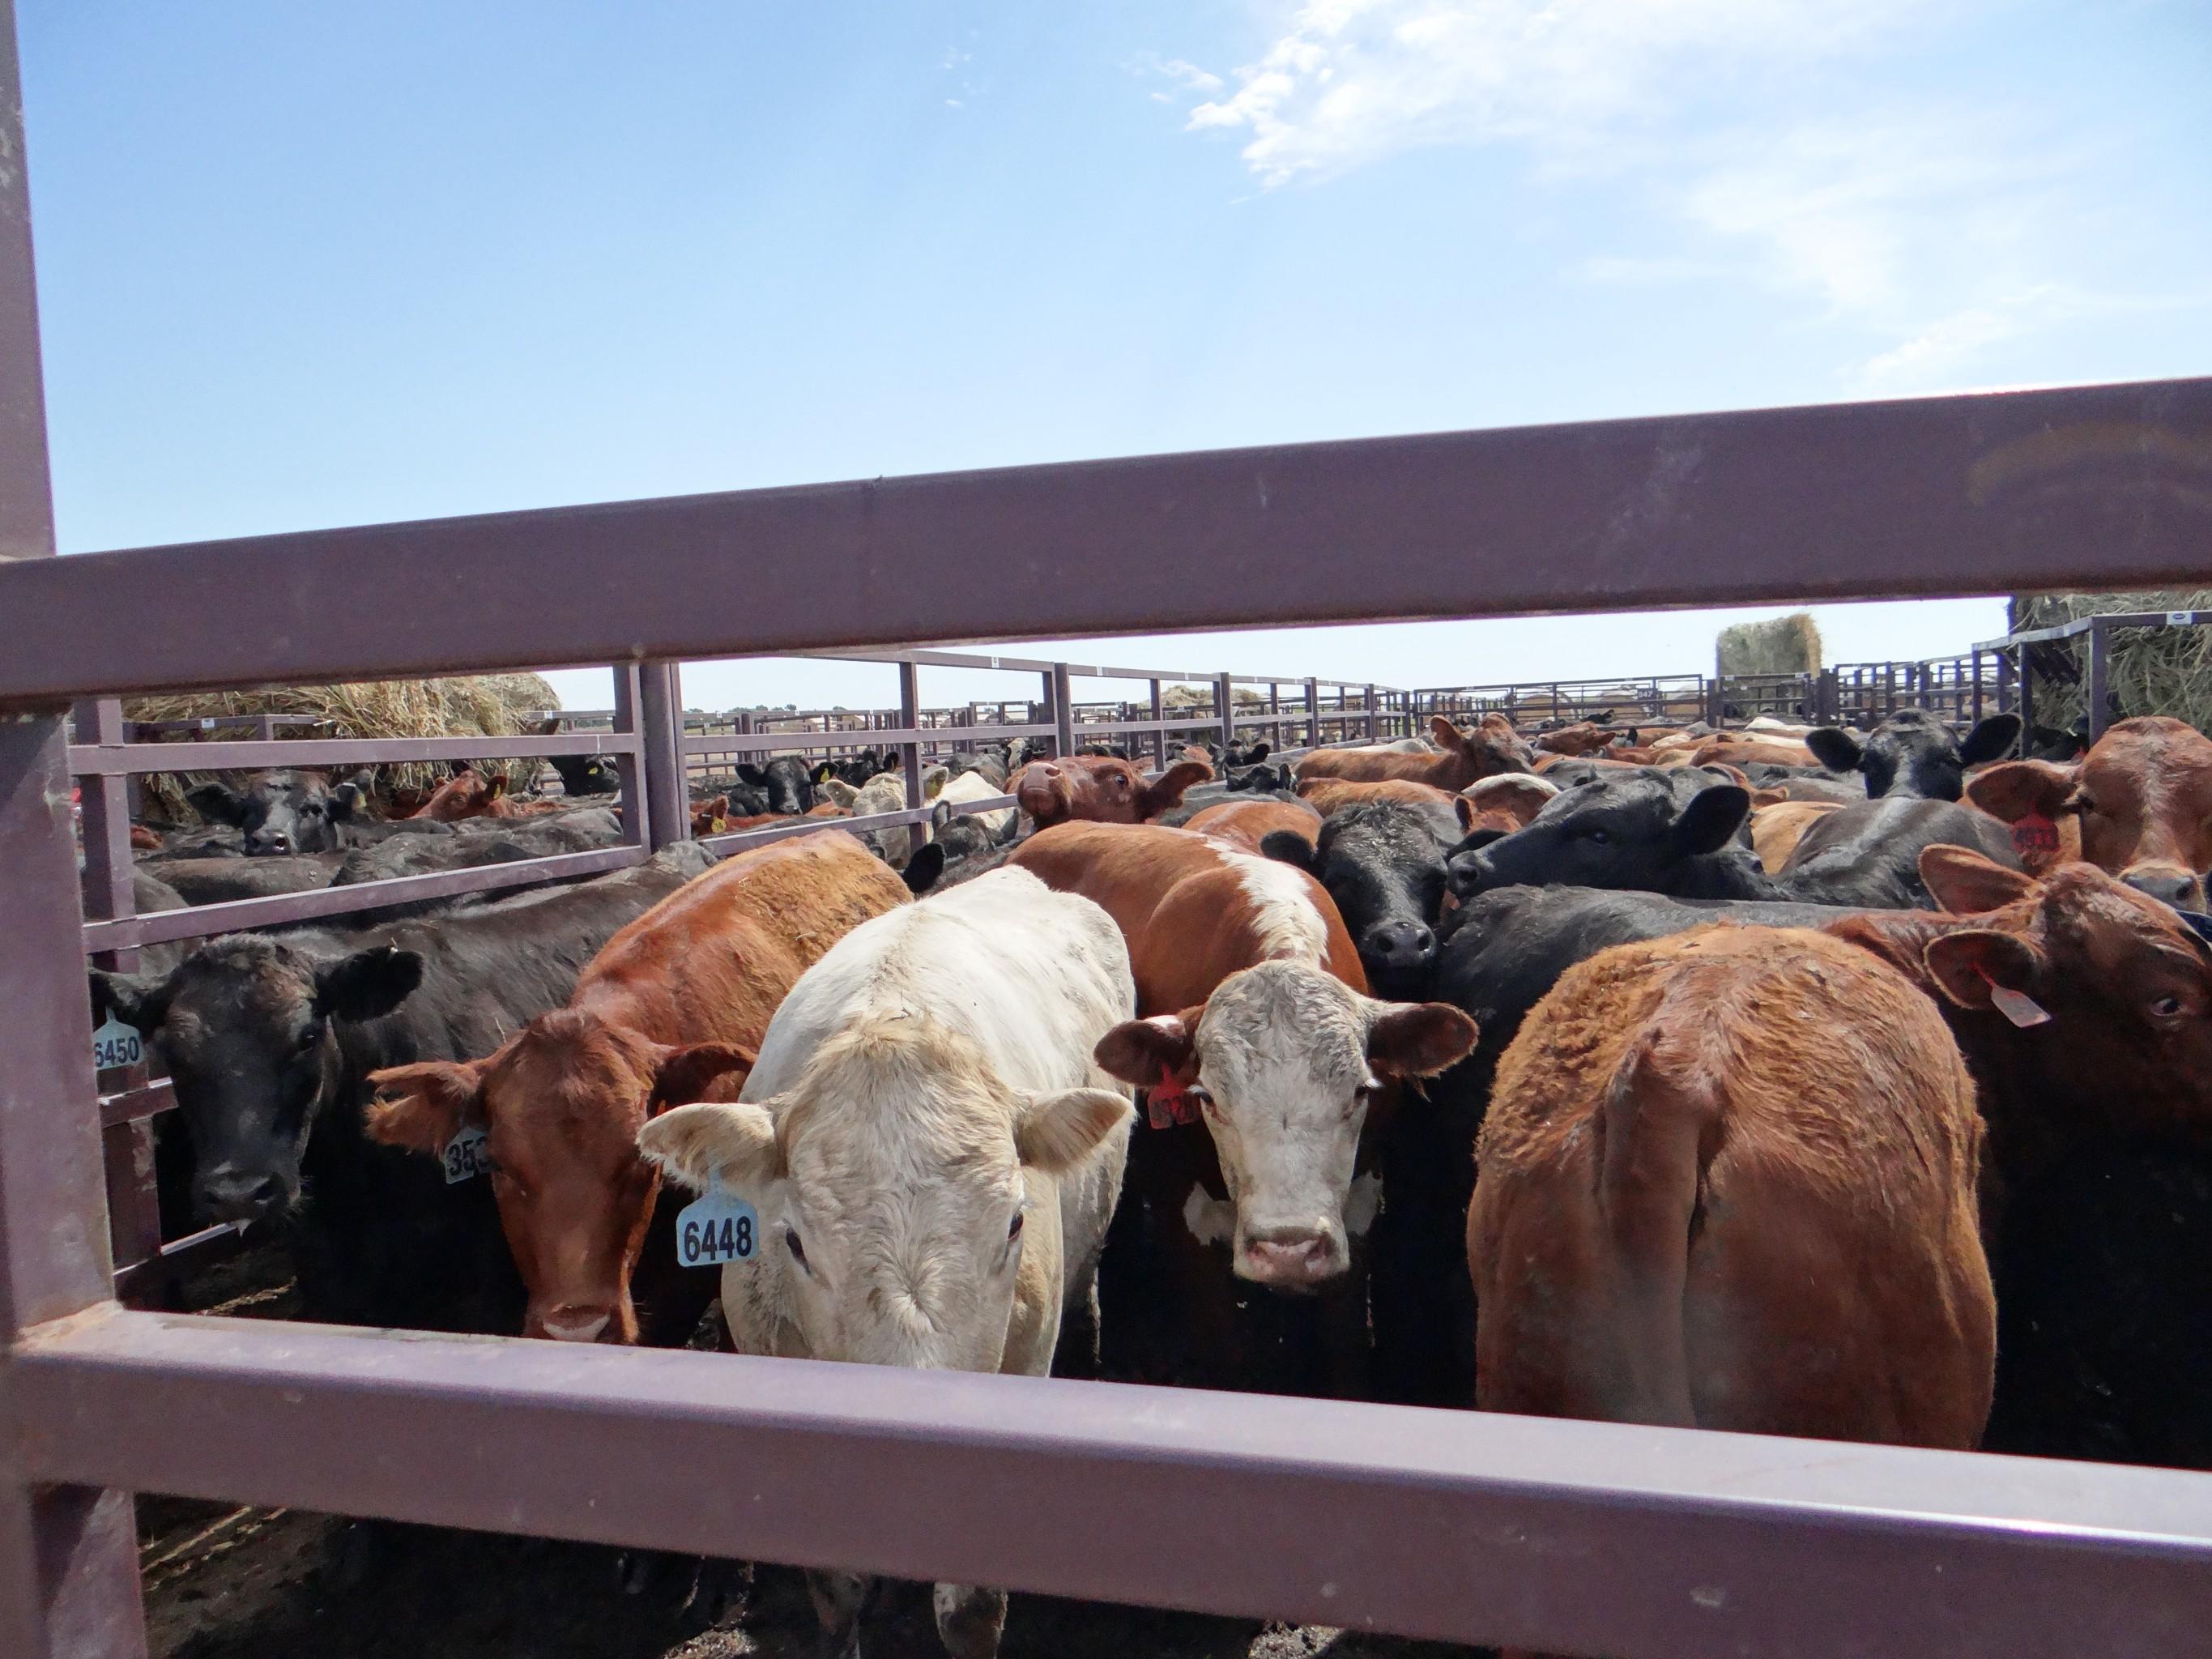 Sioux Falls Regional Livestock | Cattle Auction